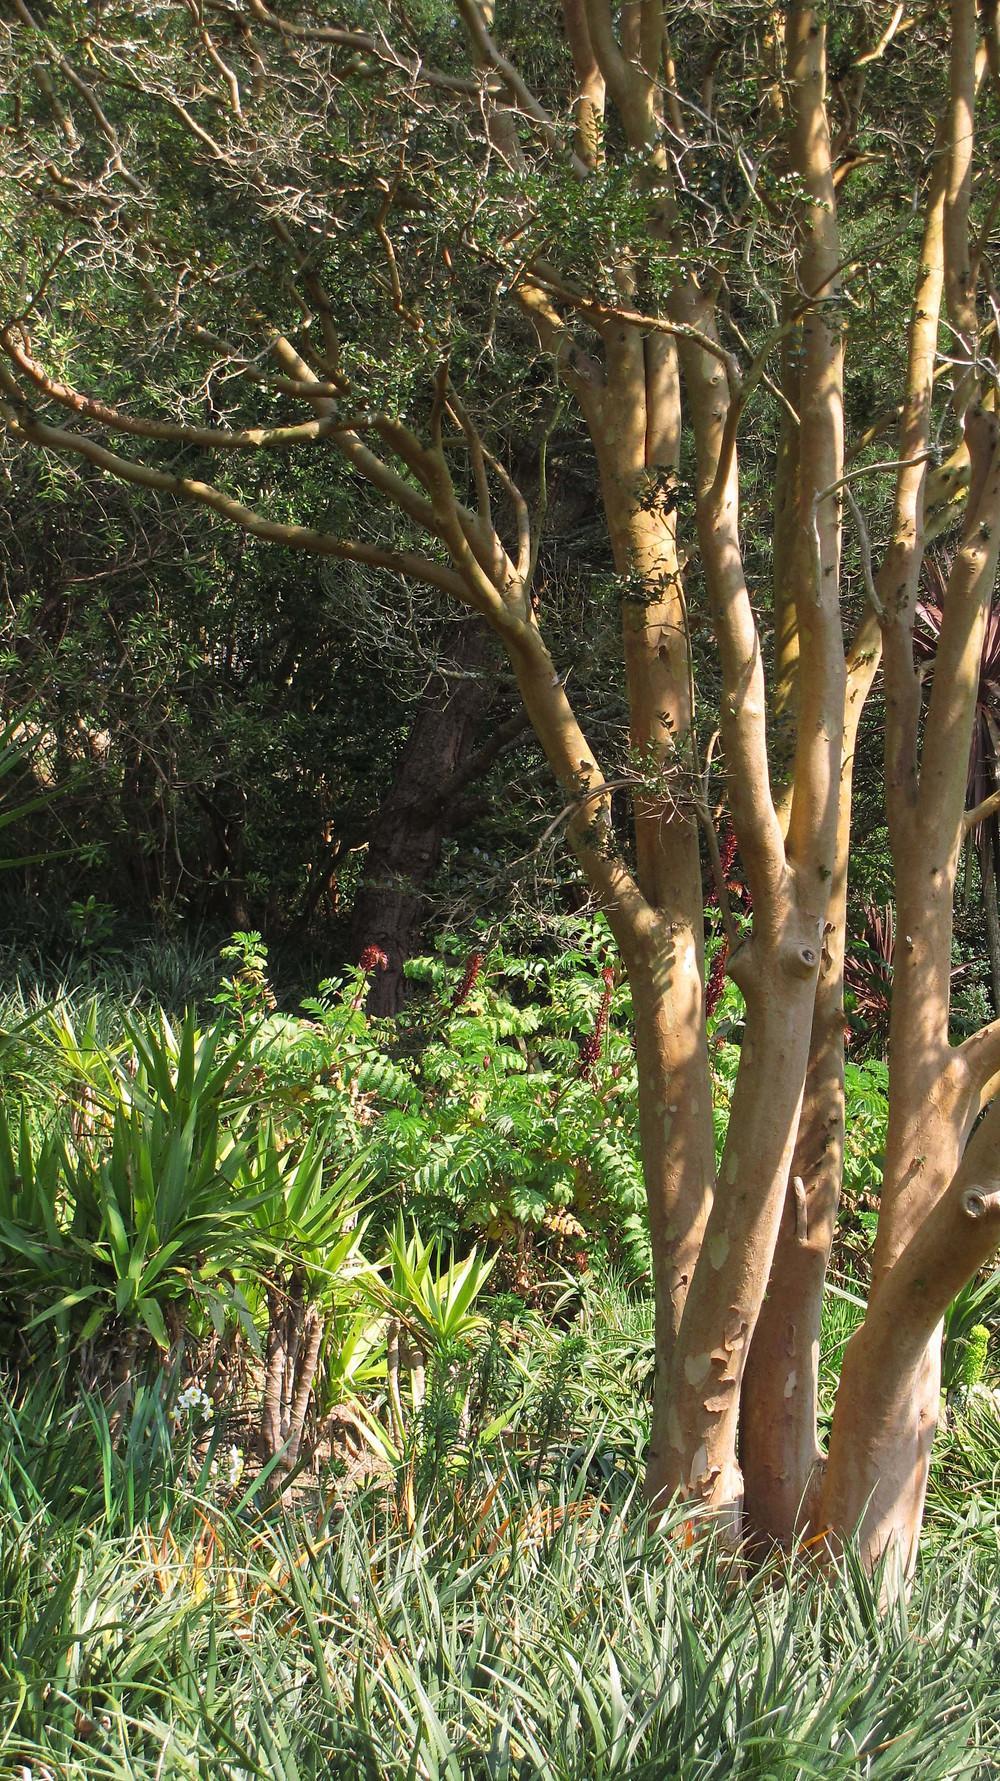 mediterannean plants, euphorbia, phormium, myrtle, devon garden, yucca, melianthus major,